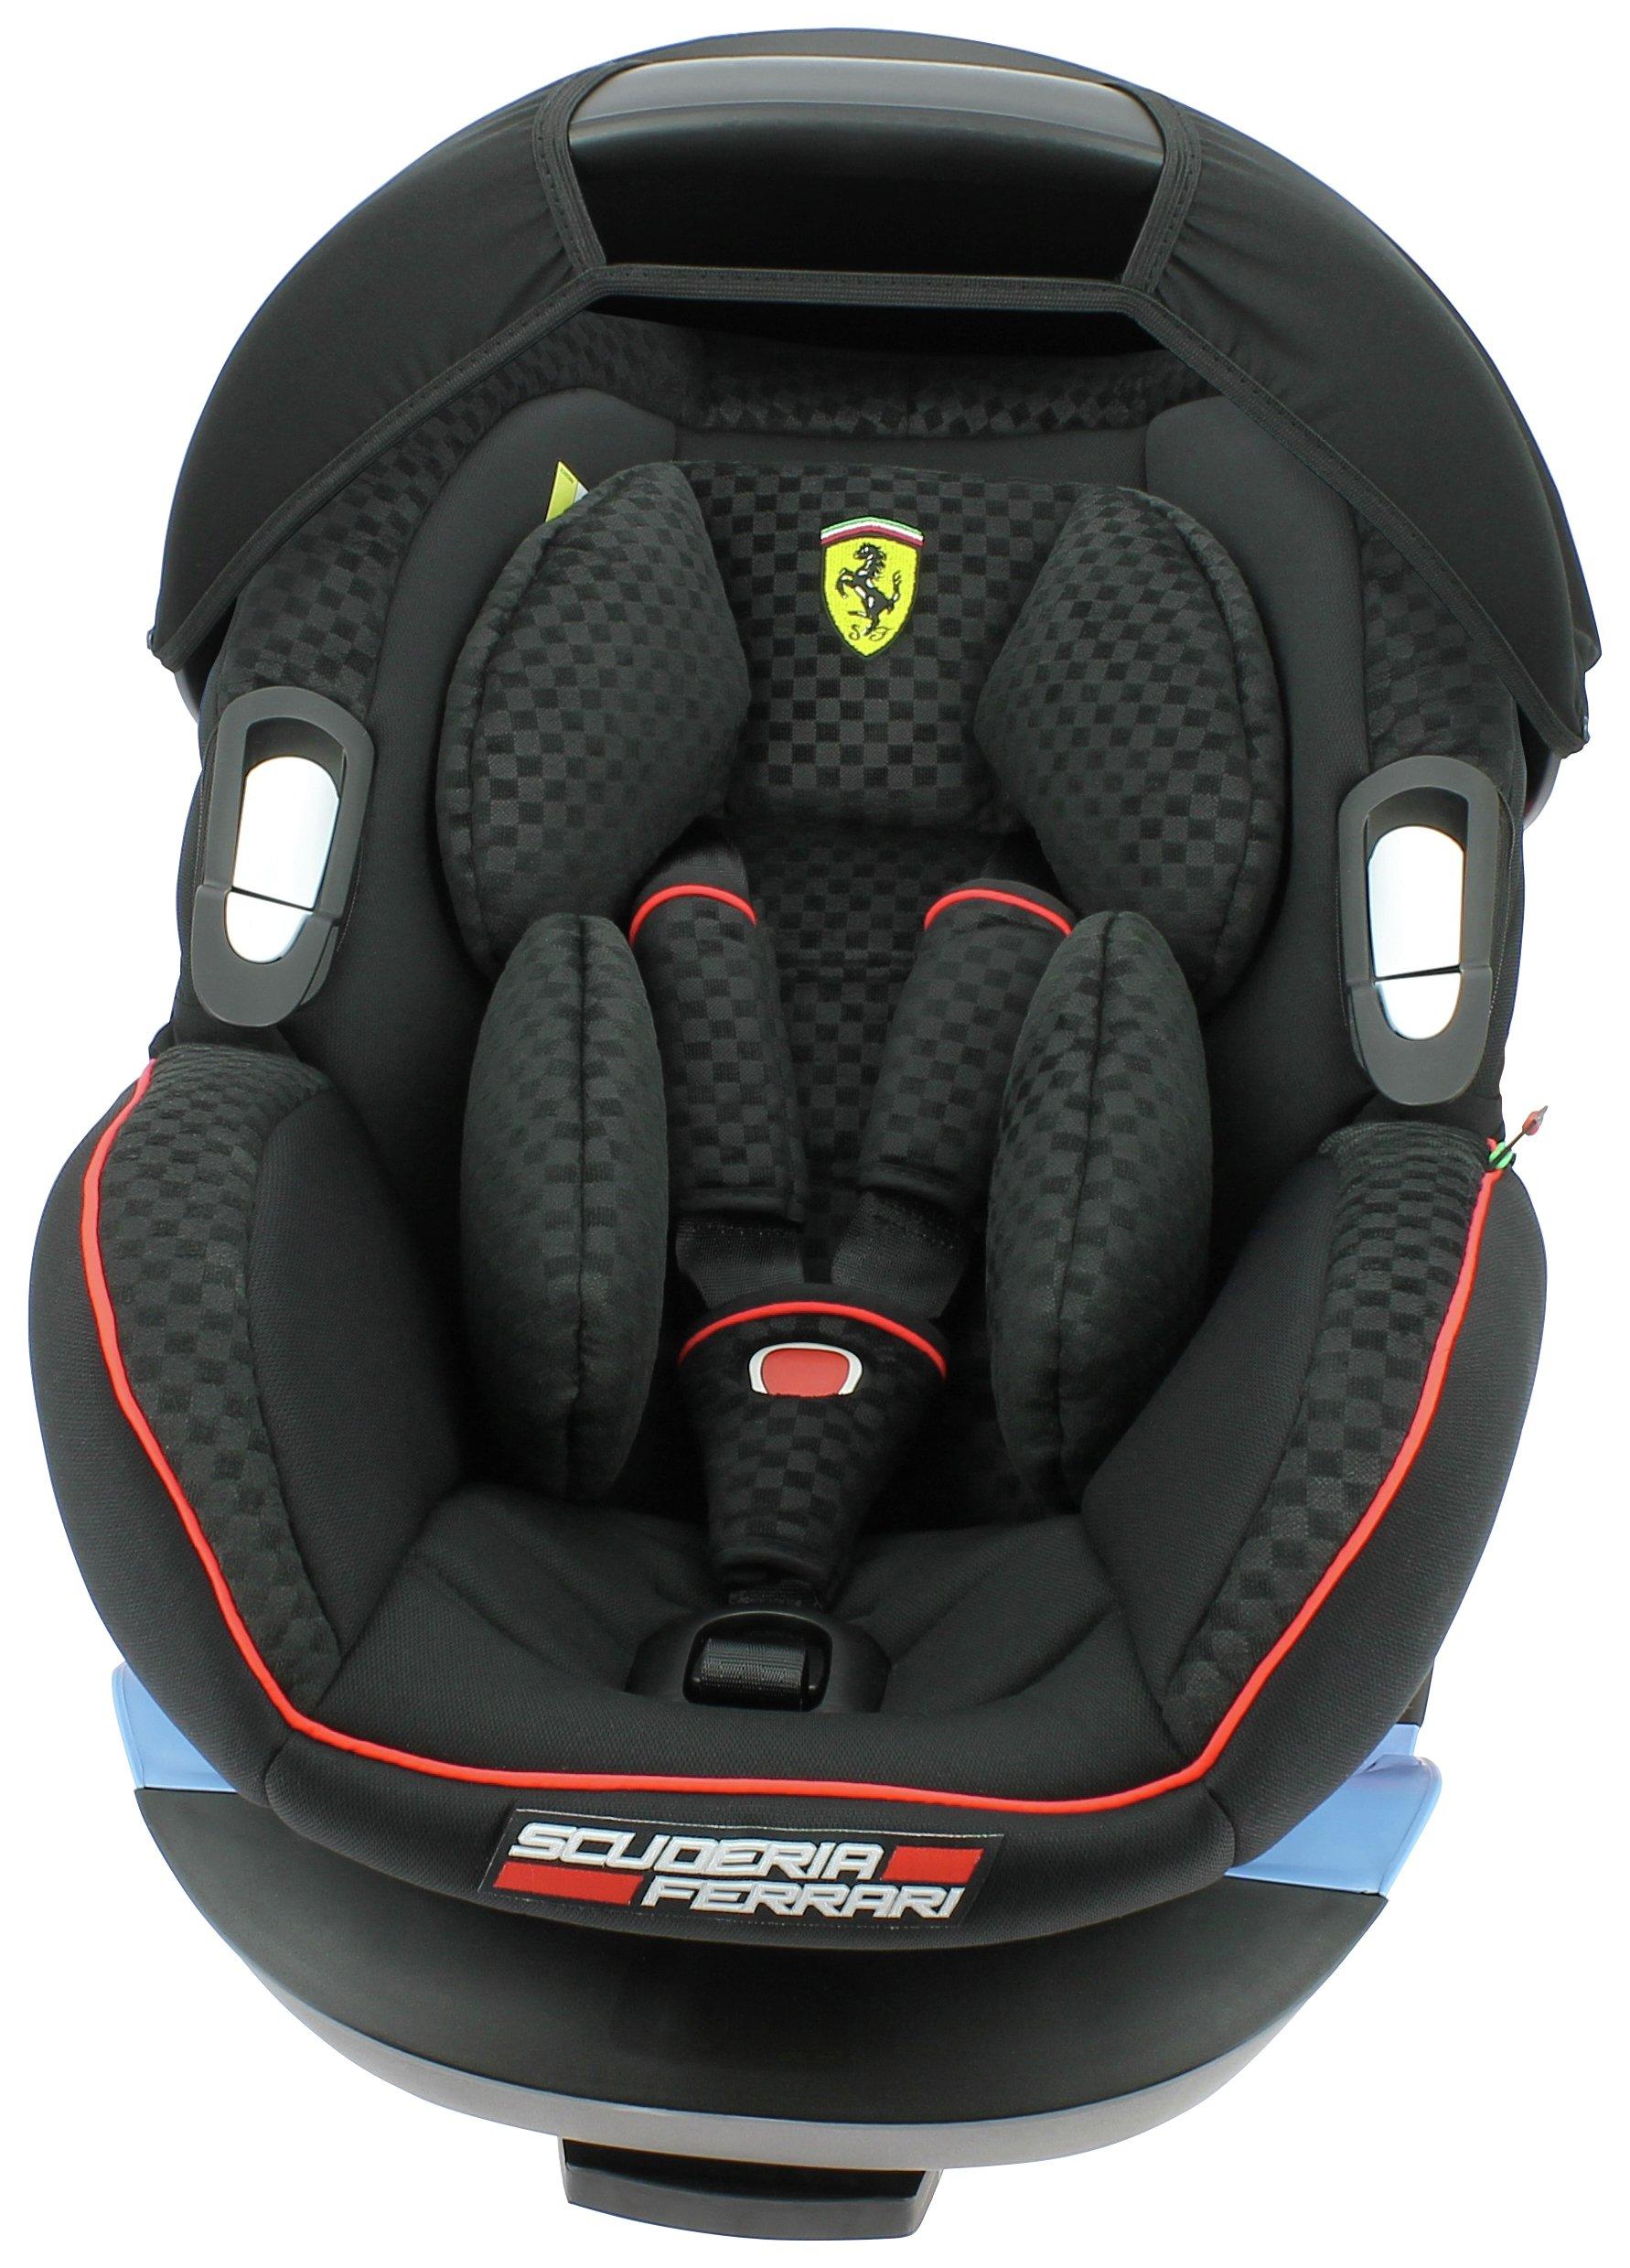 tt-migo-ferrari-satellite-group-0-infant-seat